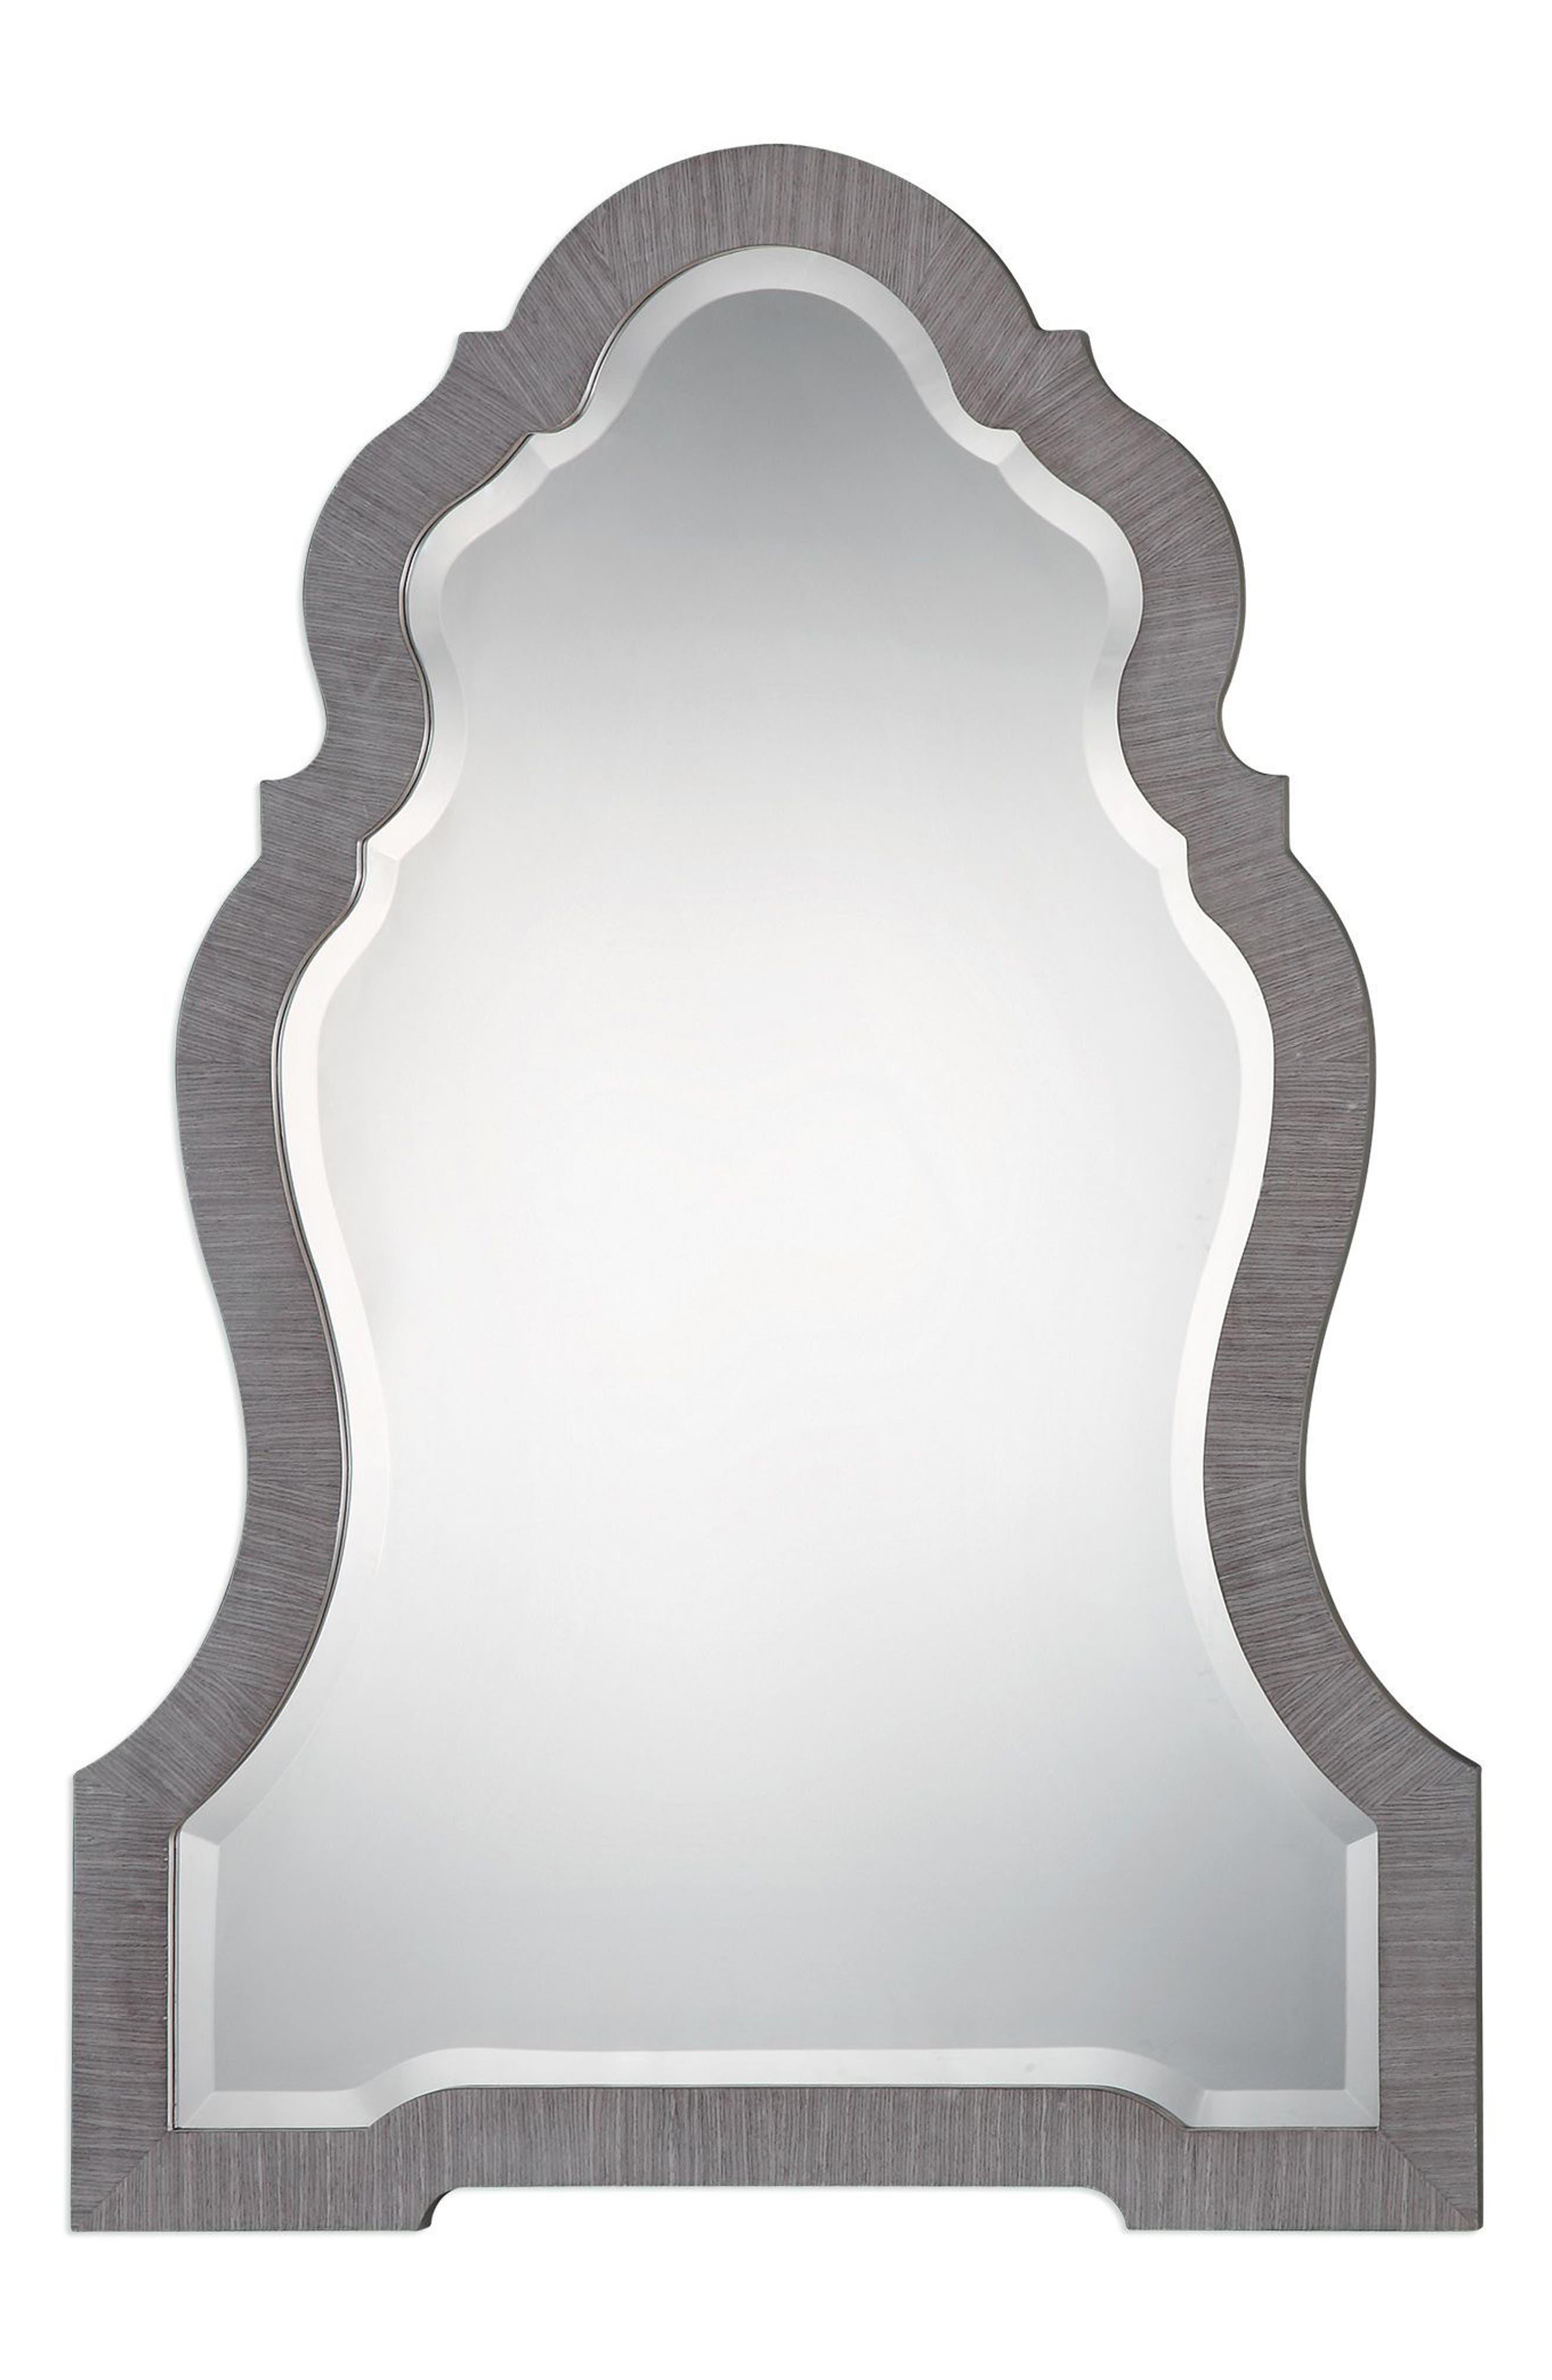 Carroll Wall Mirror,                             Main thumbnail 1, color,                             Metallic Silver